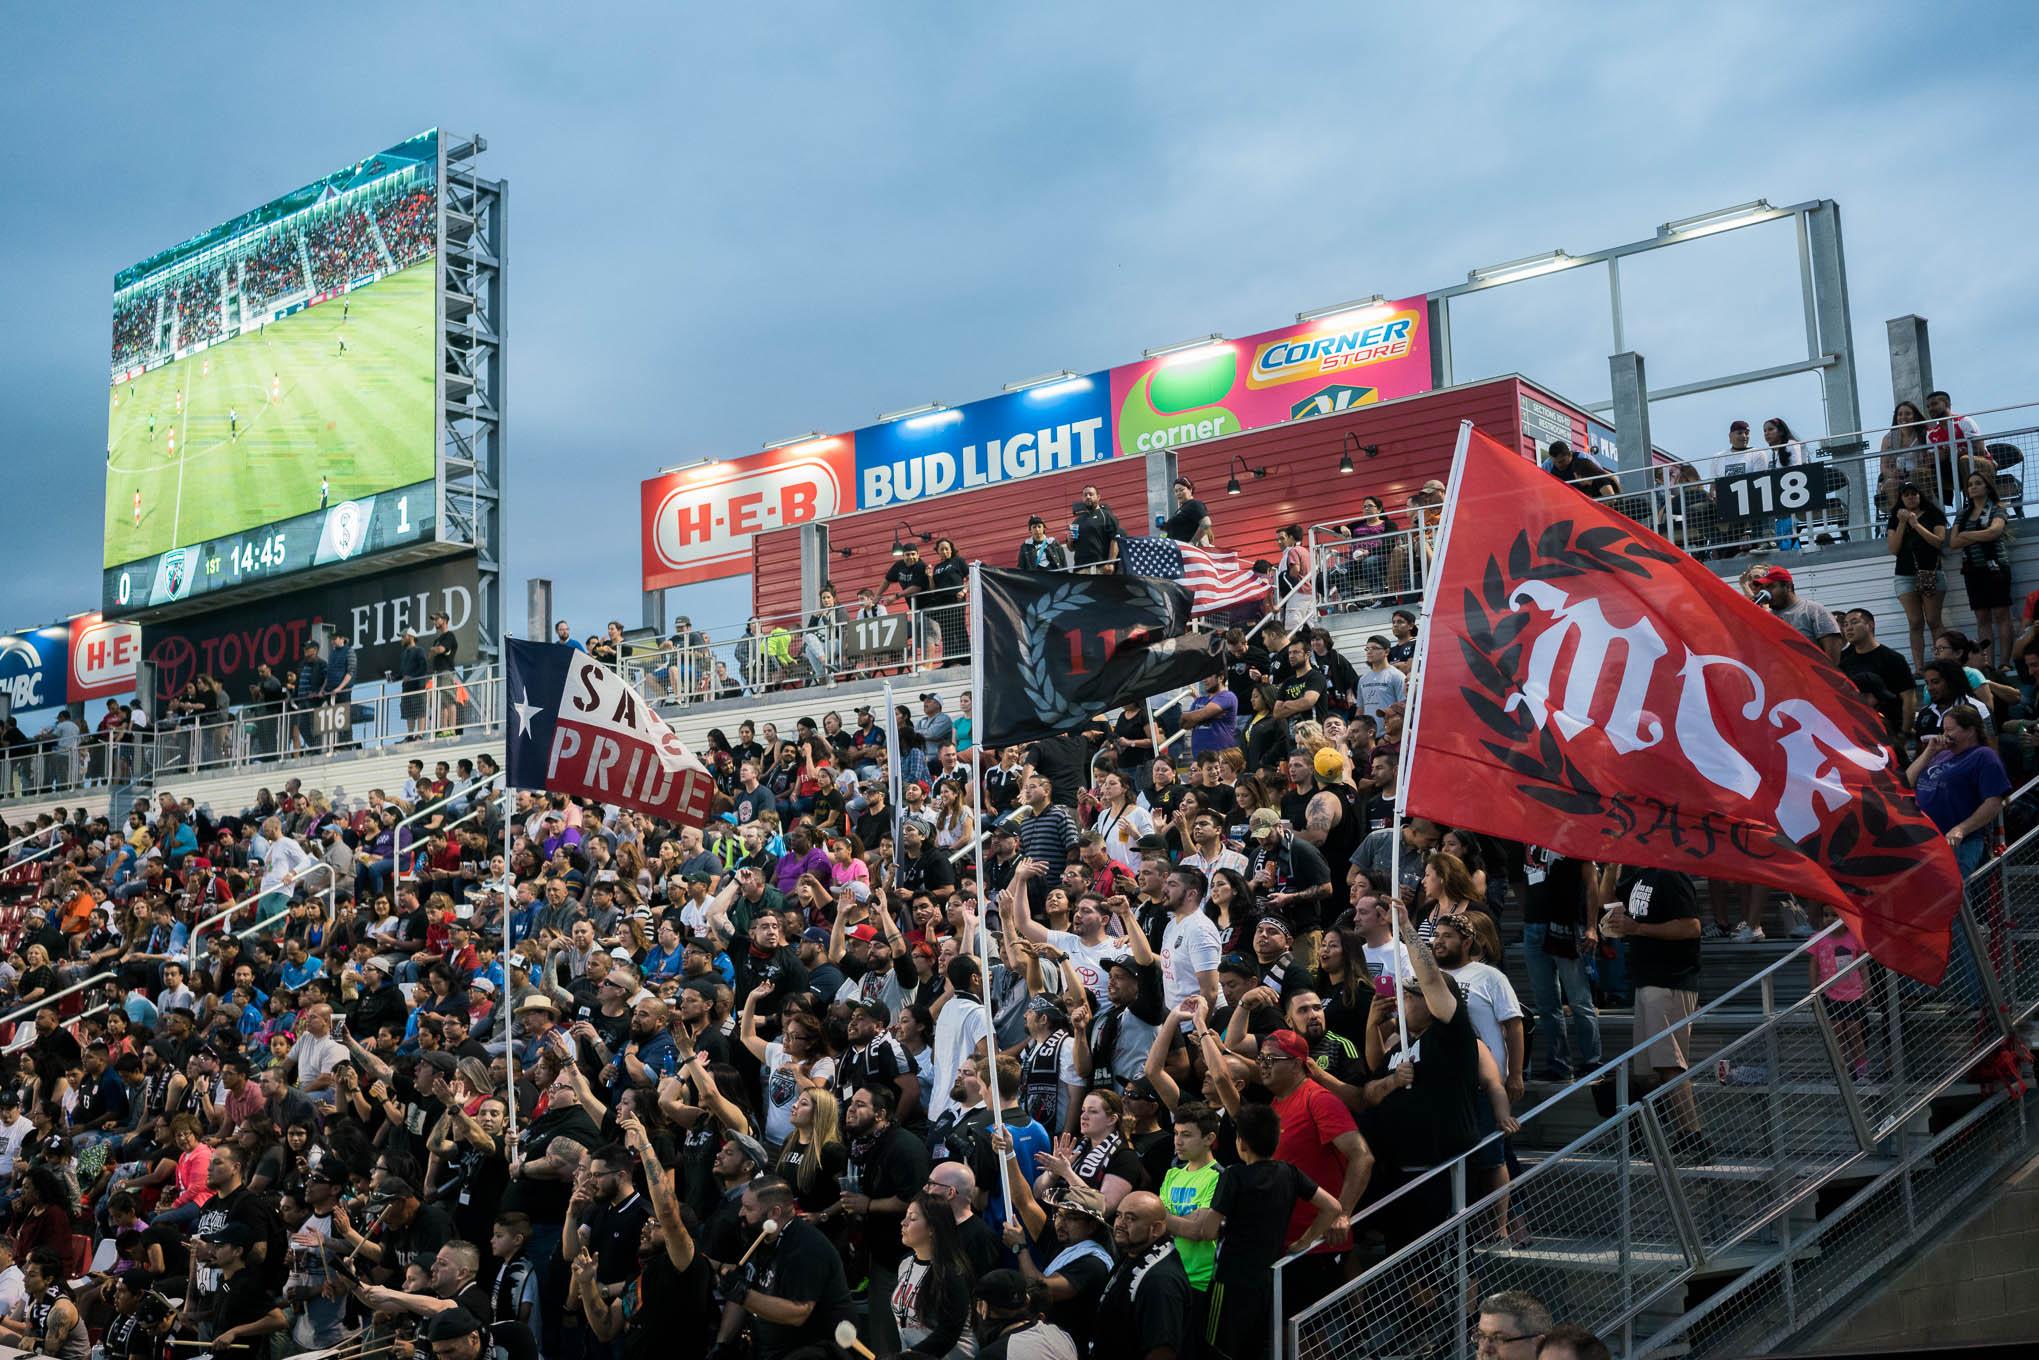 San Antonio FC fans cheer loudly against Swope Park. Photo by Kathryn Boyd-Batstone